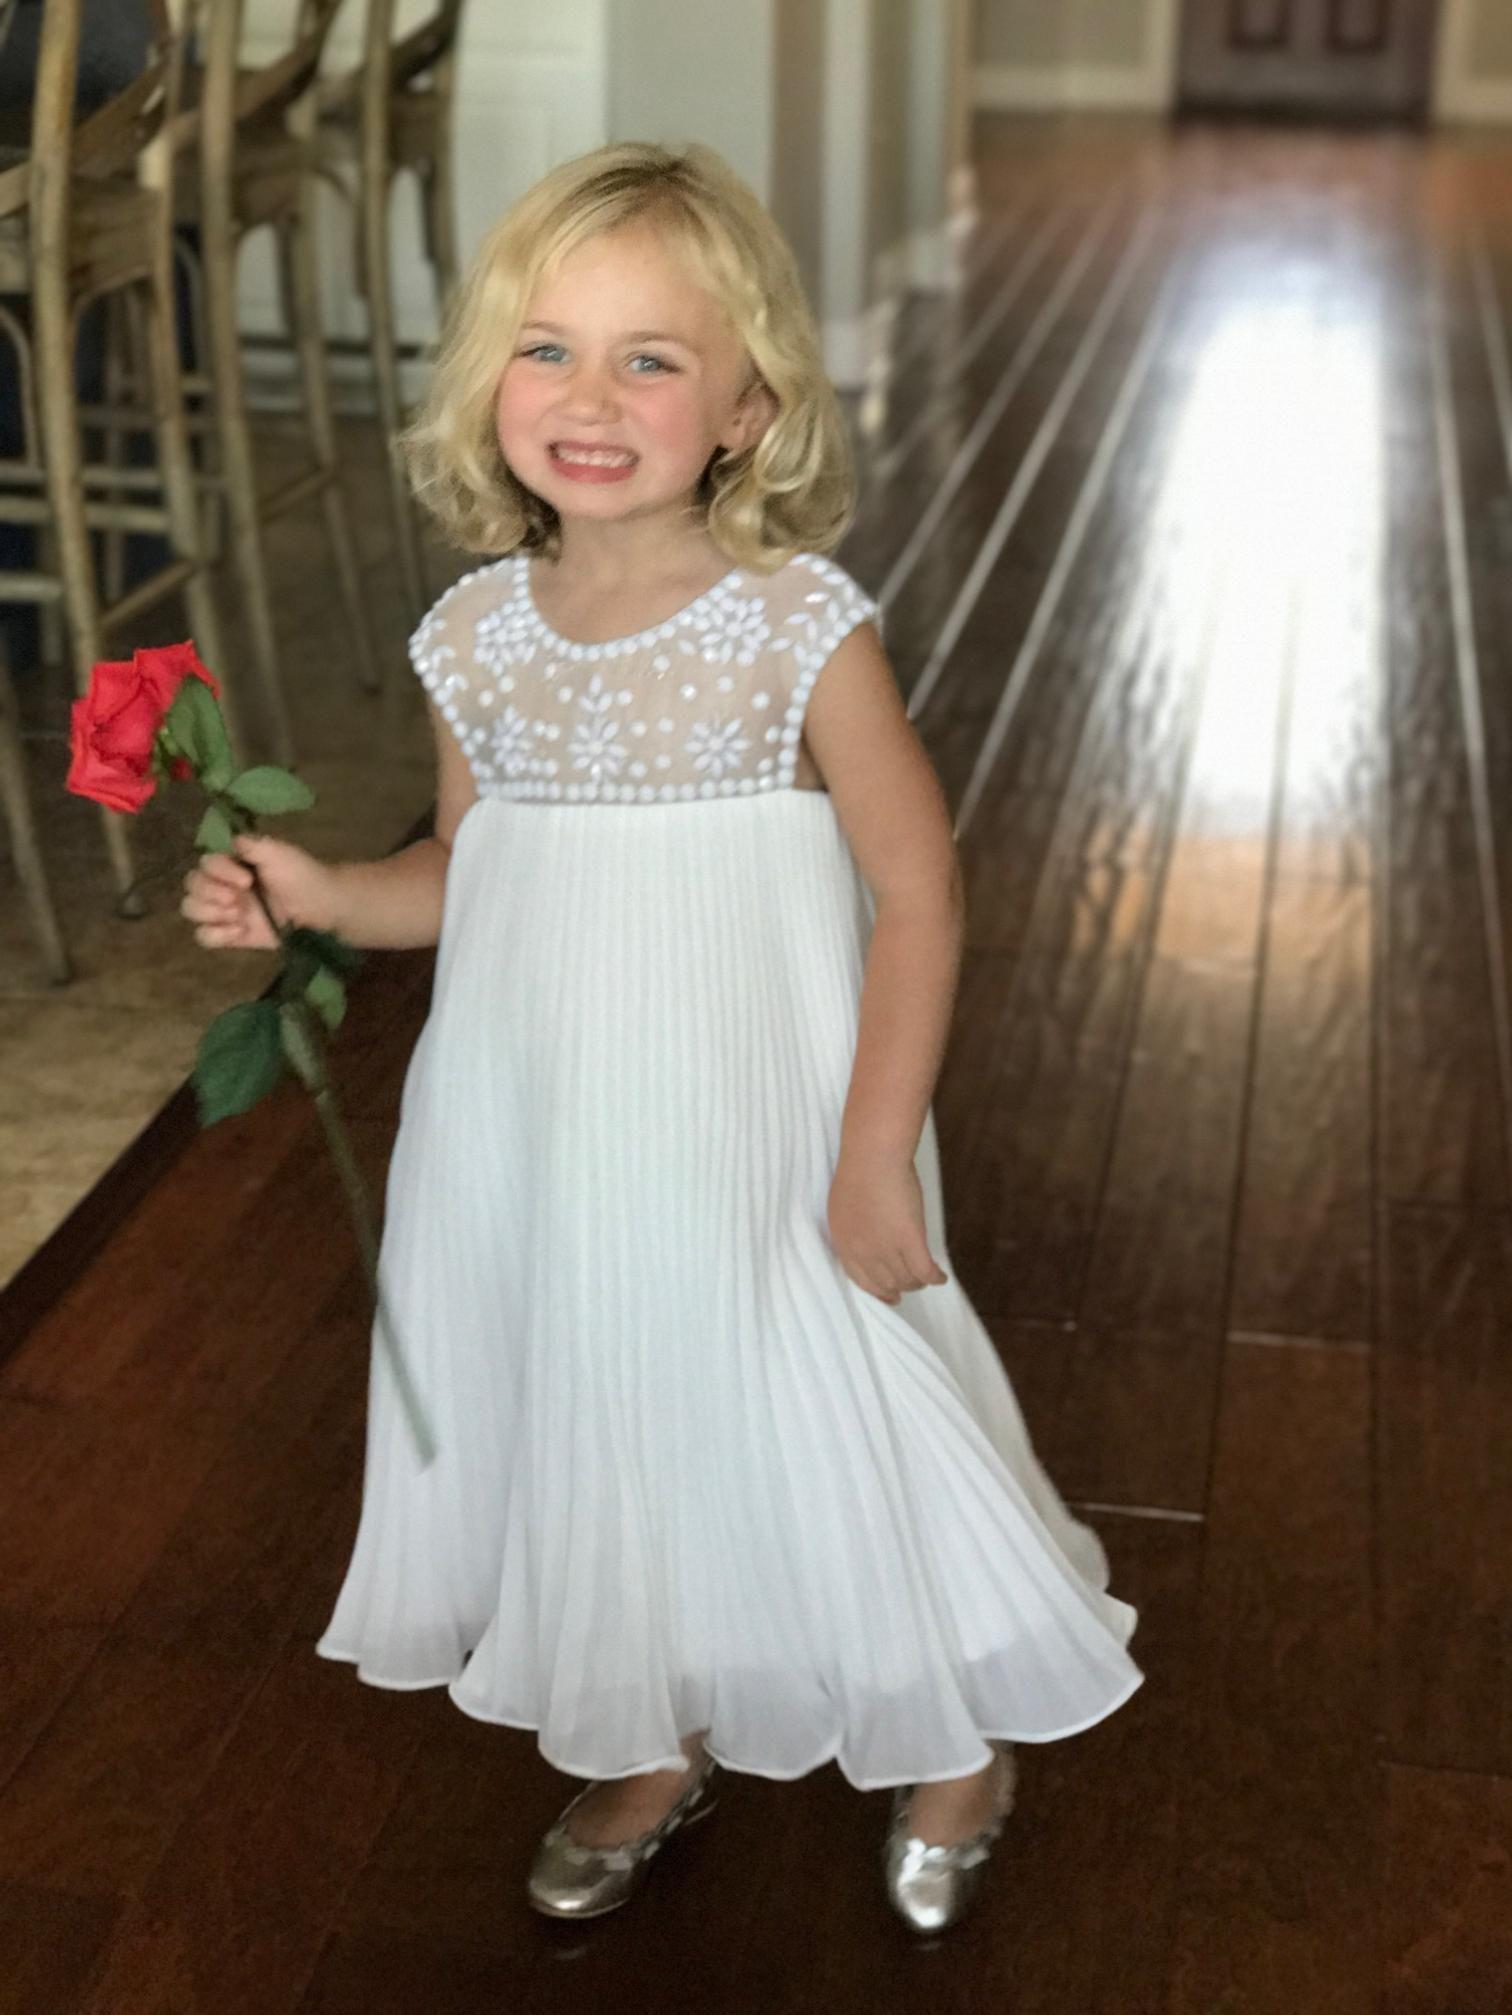 7bdf3a303 A-Line/Princess Knee-length Flower Girl Dress - Chiffon Sleeveless Scoop  Neck With Ruffles/Beading (010090966) - Flower Girl Dresses - JJsHouse